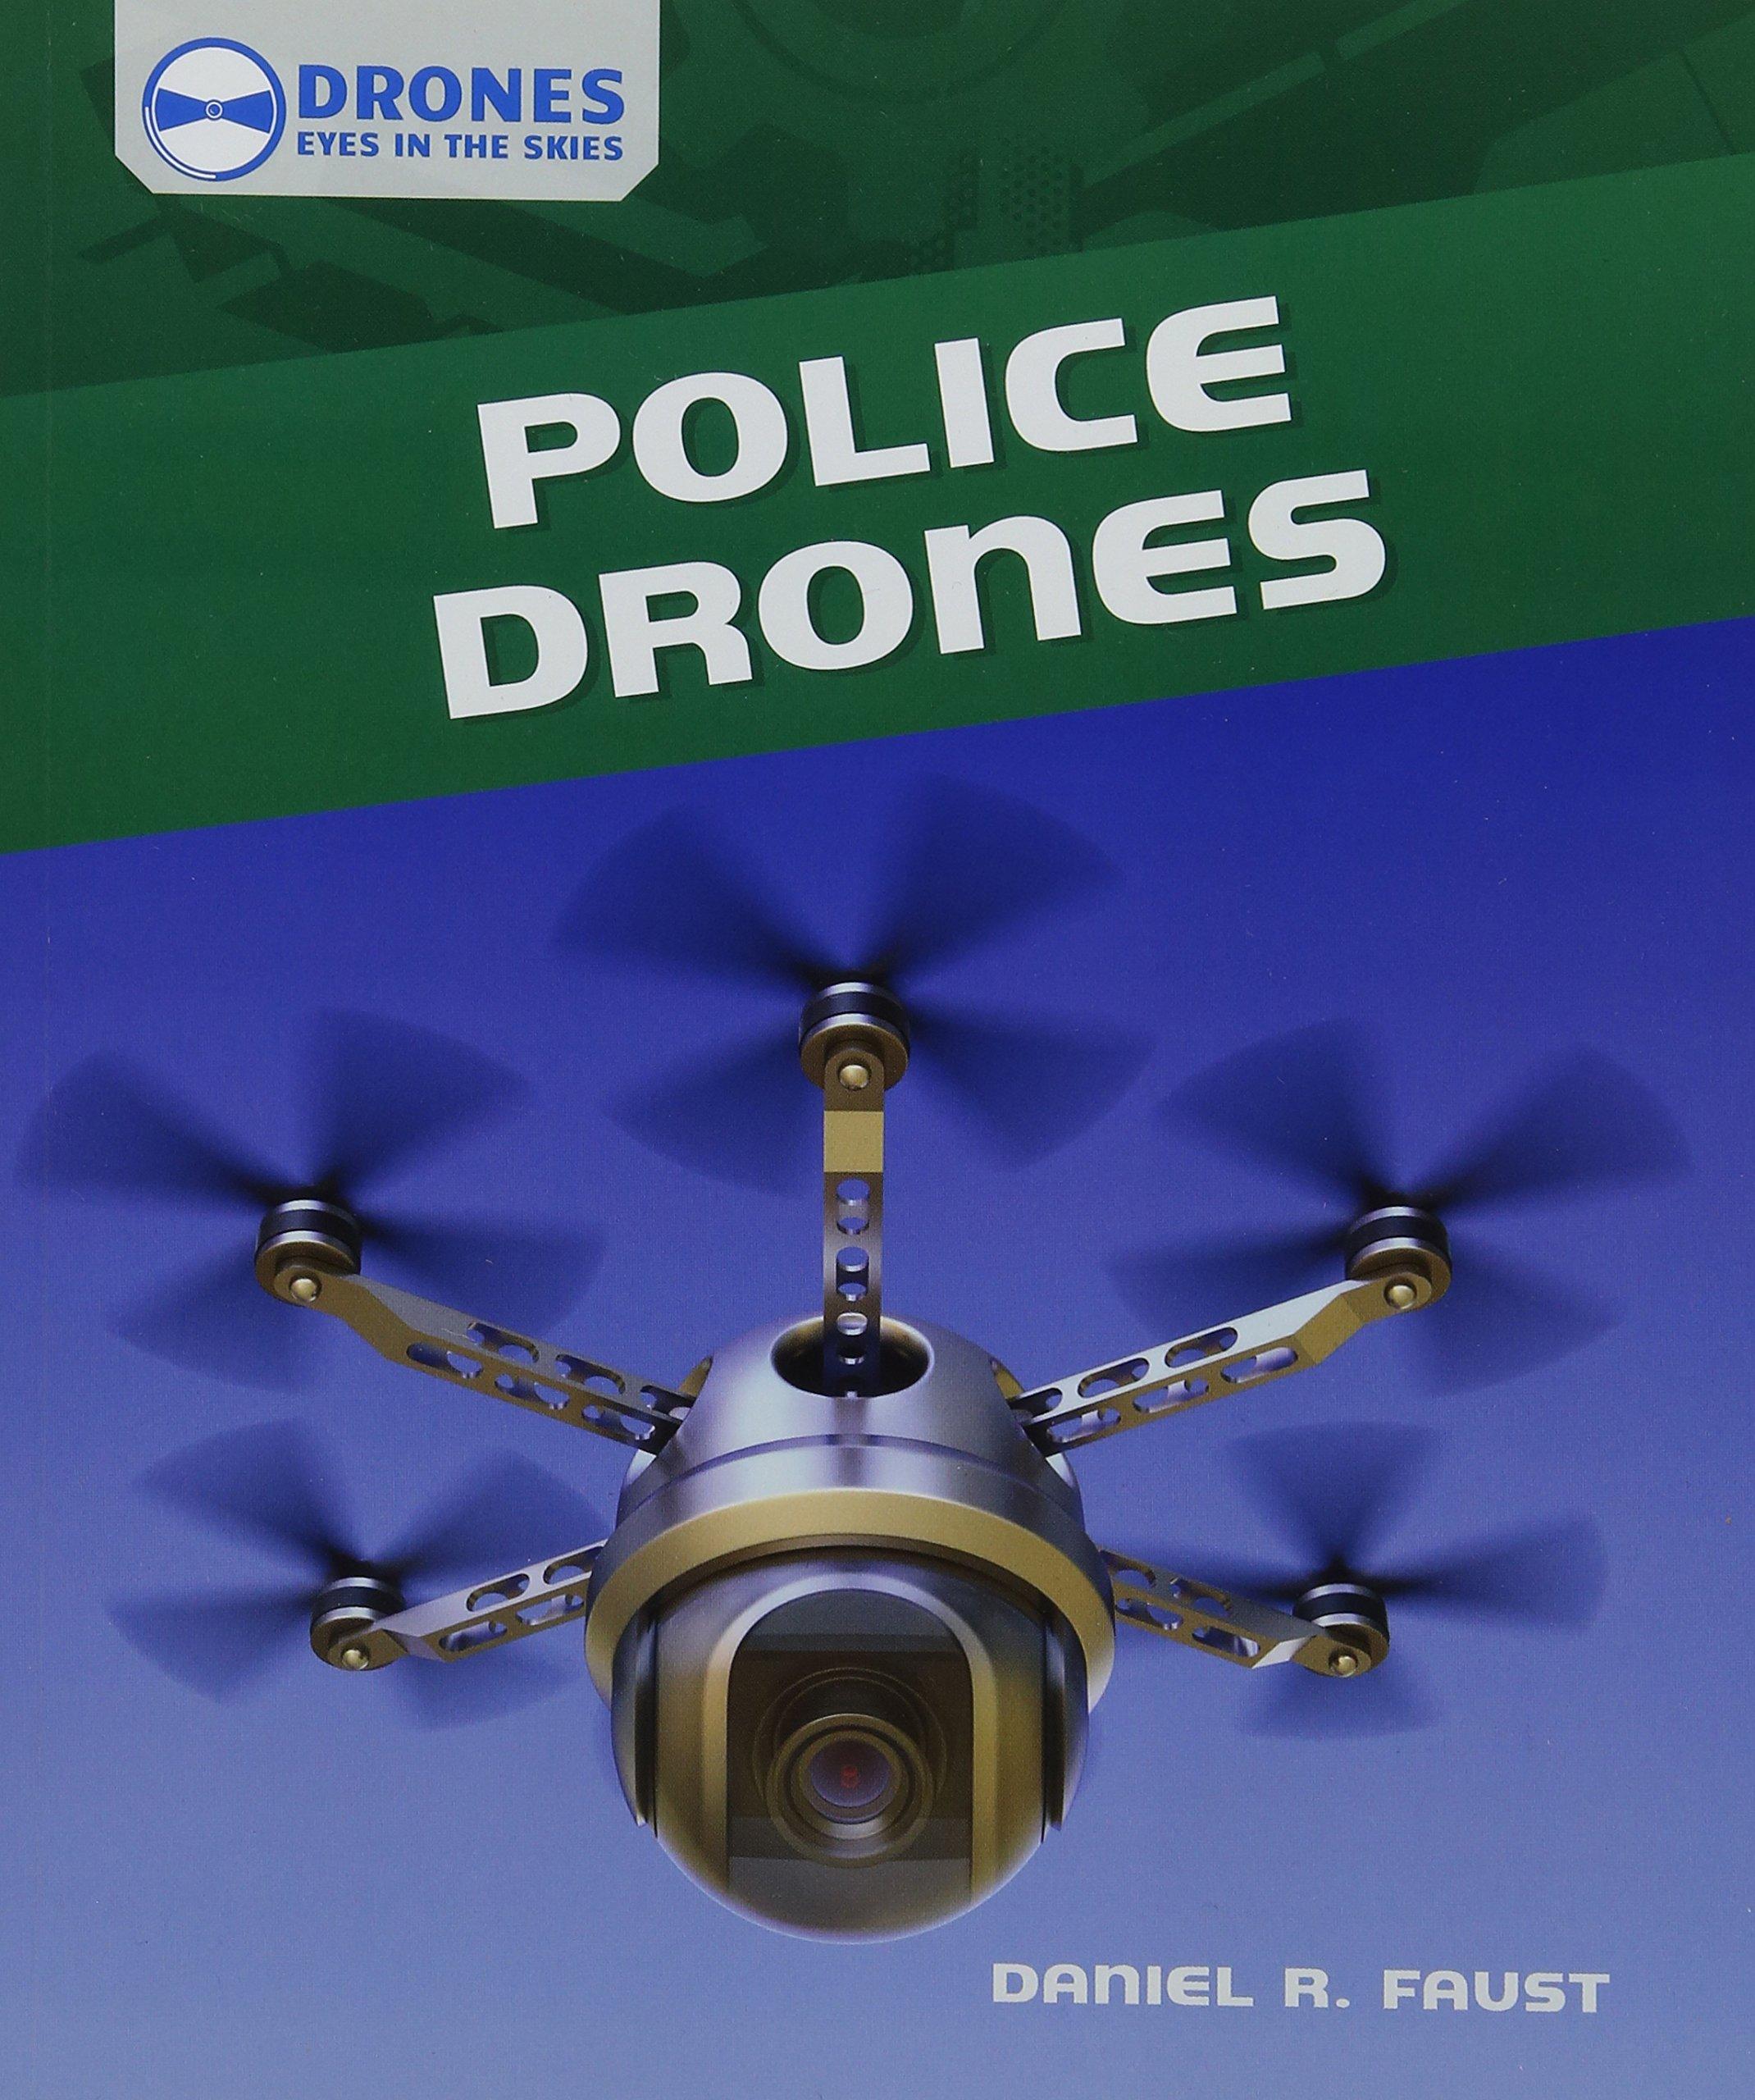 Police Drones (Drones: Eyes in the Skies) by PowerKids Press (Image #1)